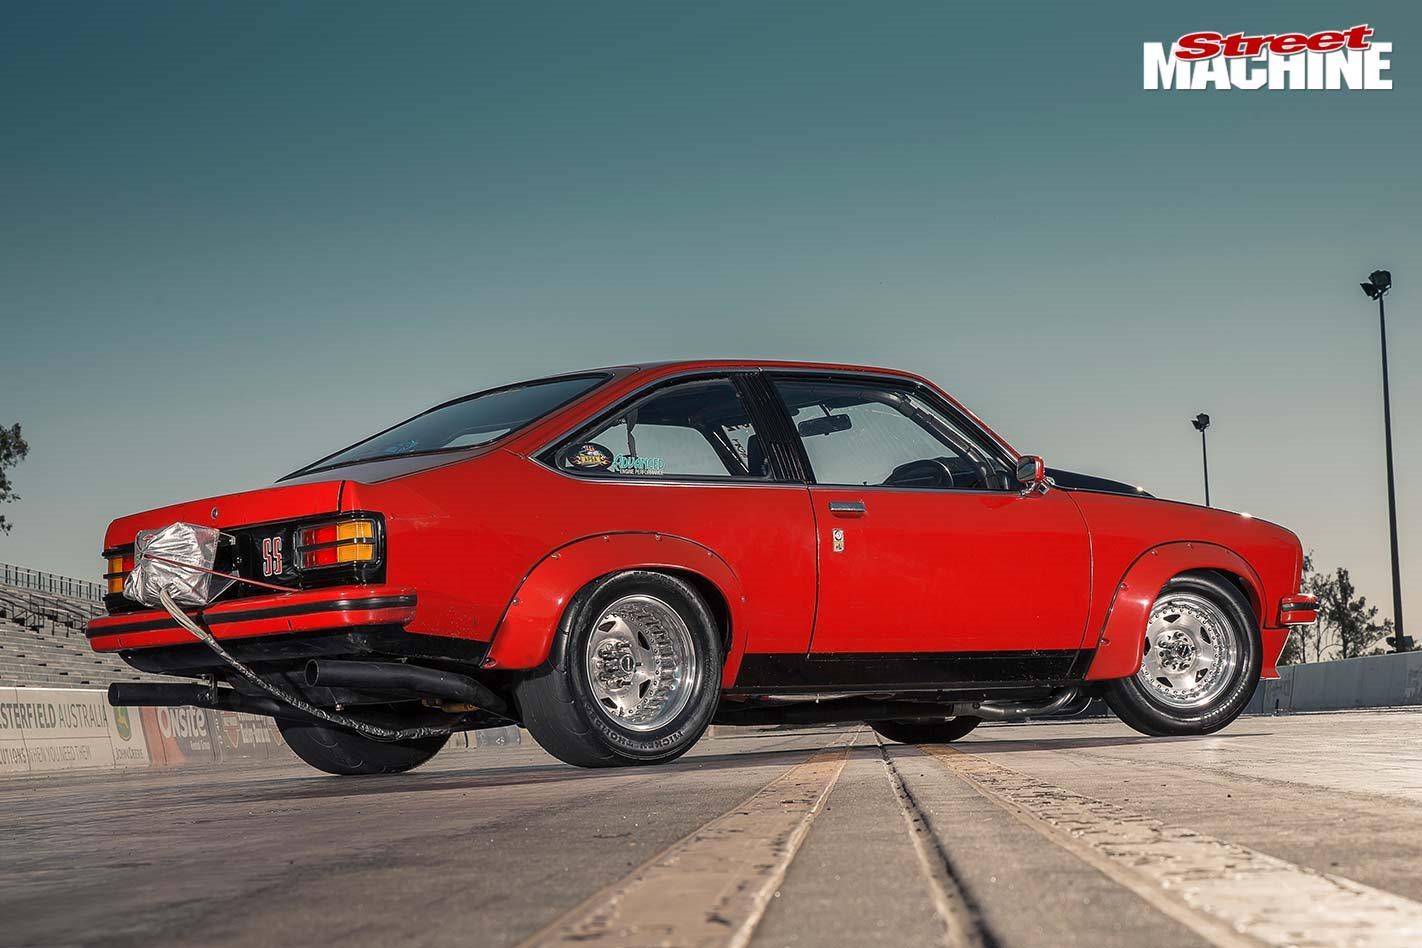 Pro street 1977 Holden LX Torana hatch - flashback